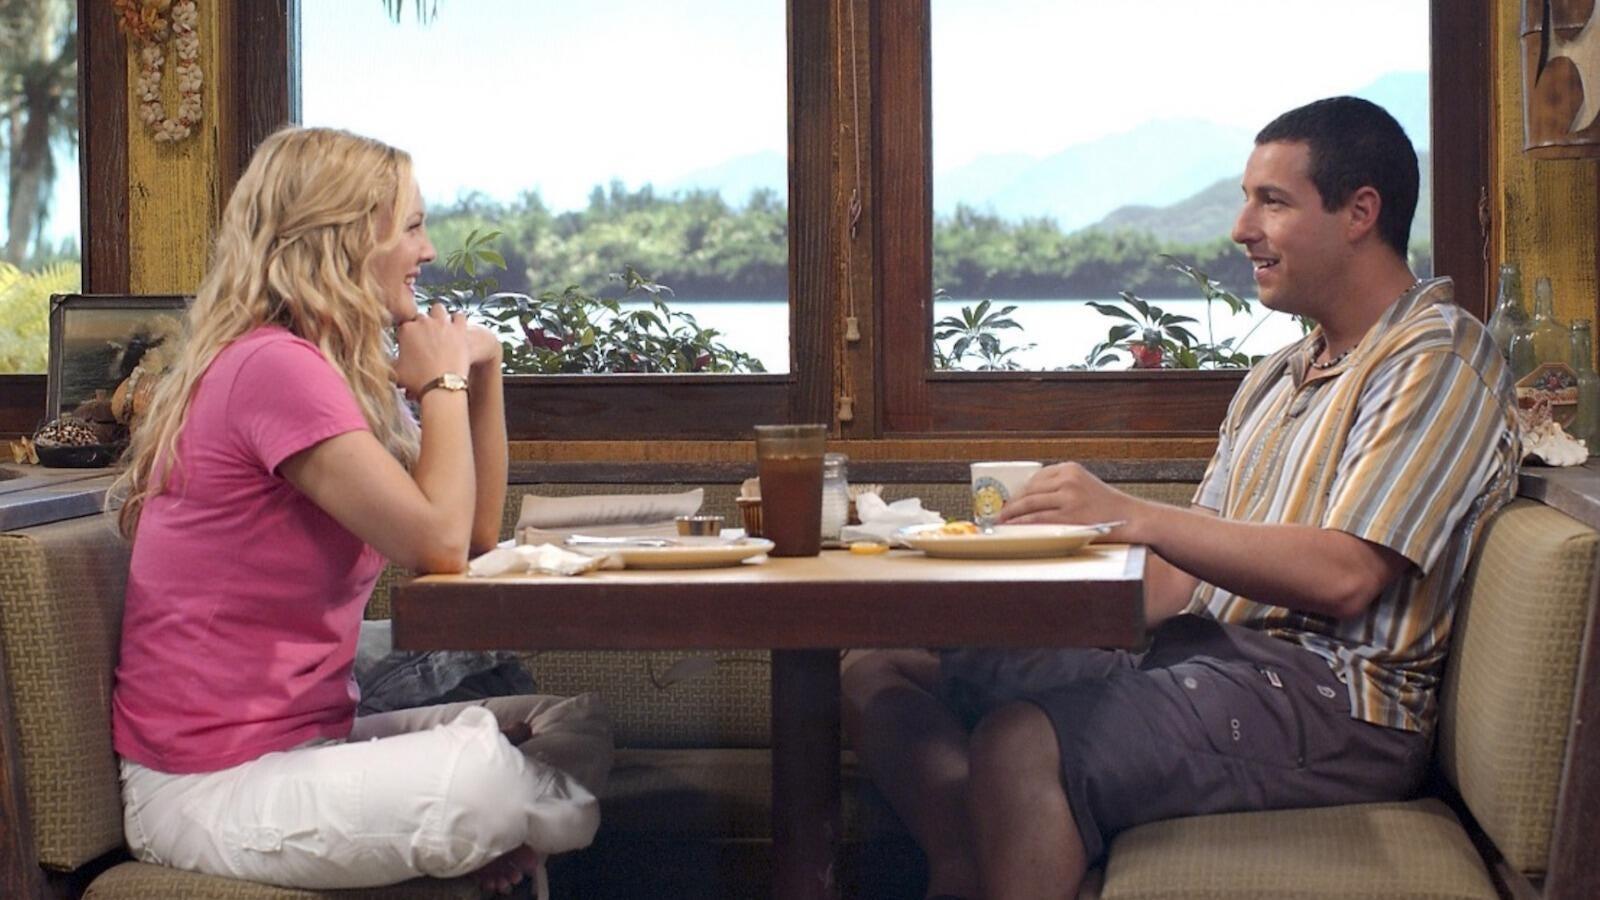 Drew Barrymore and Adam Sandler, 50 First Dates